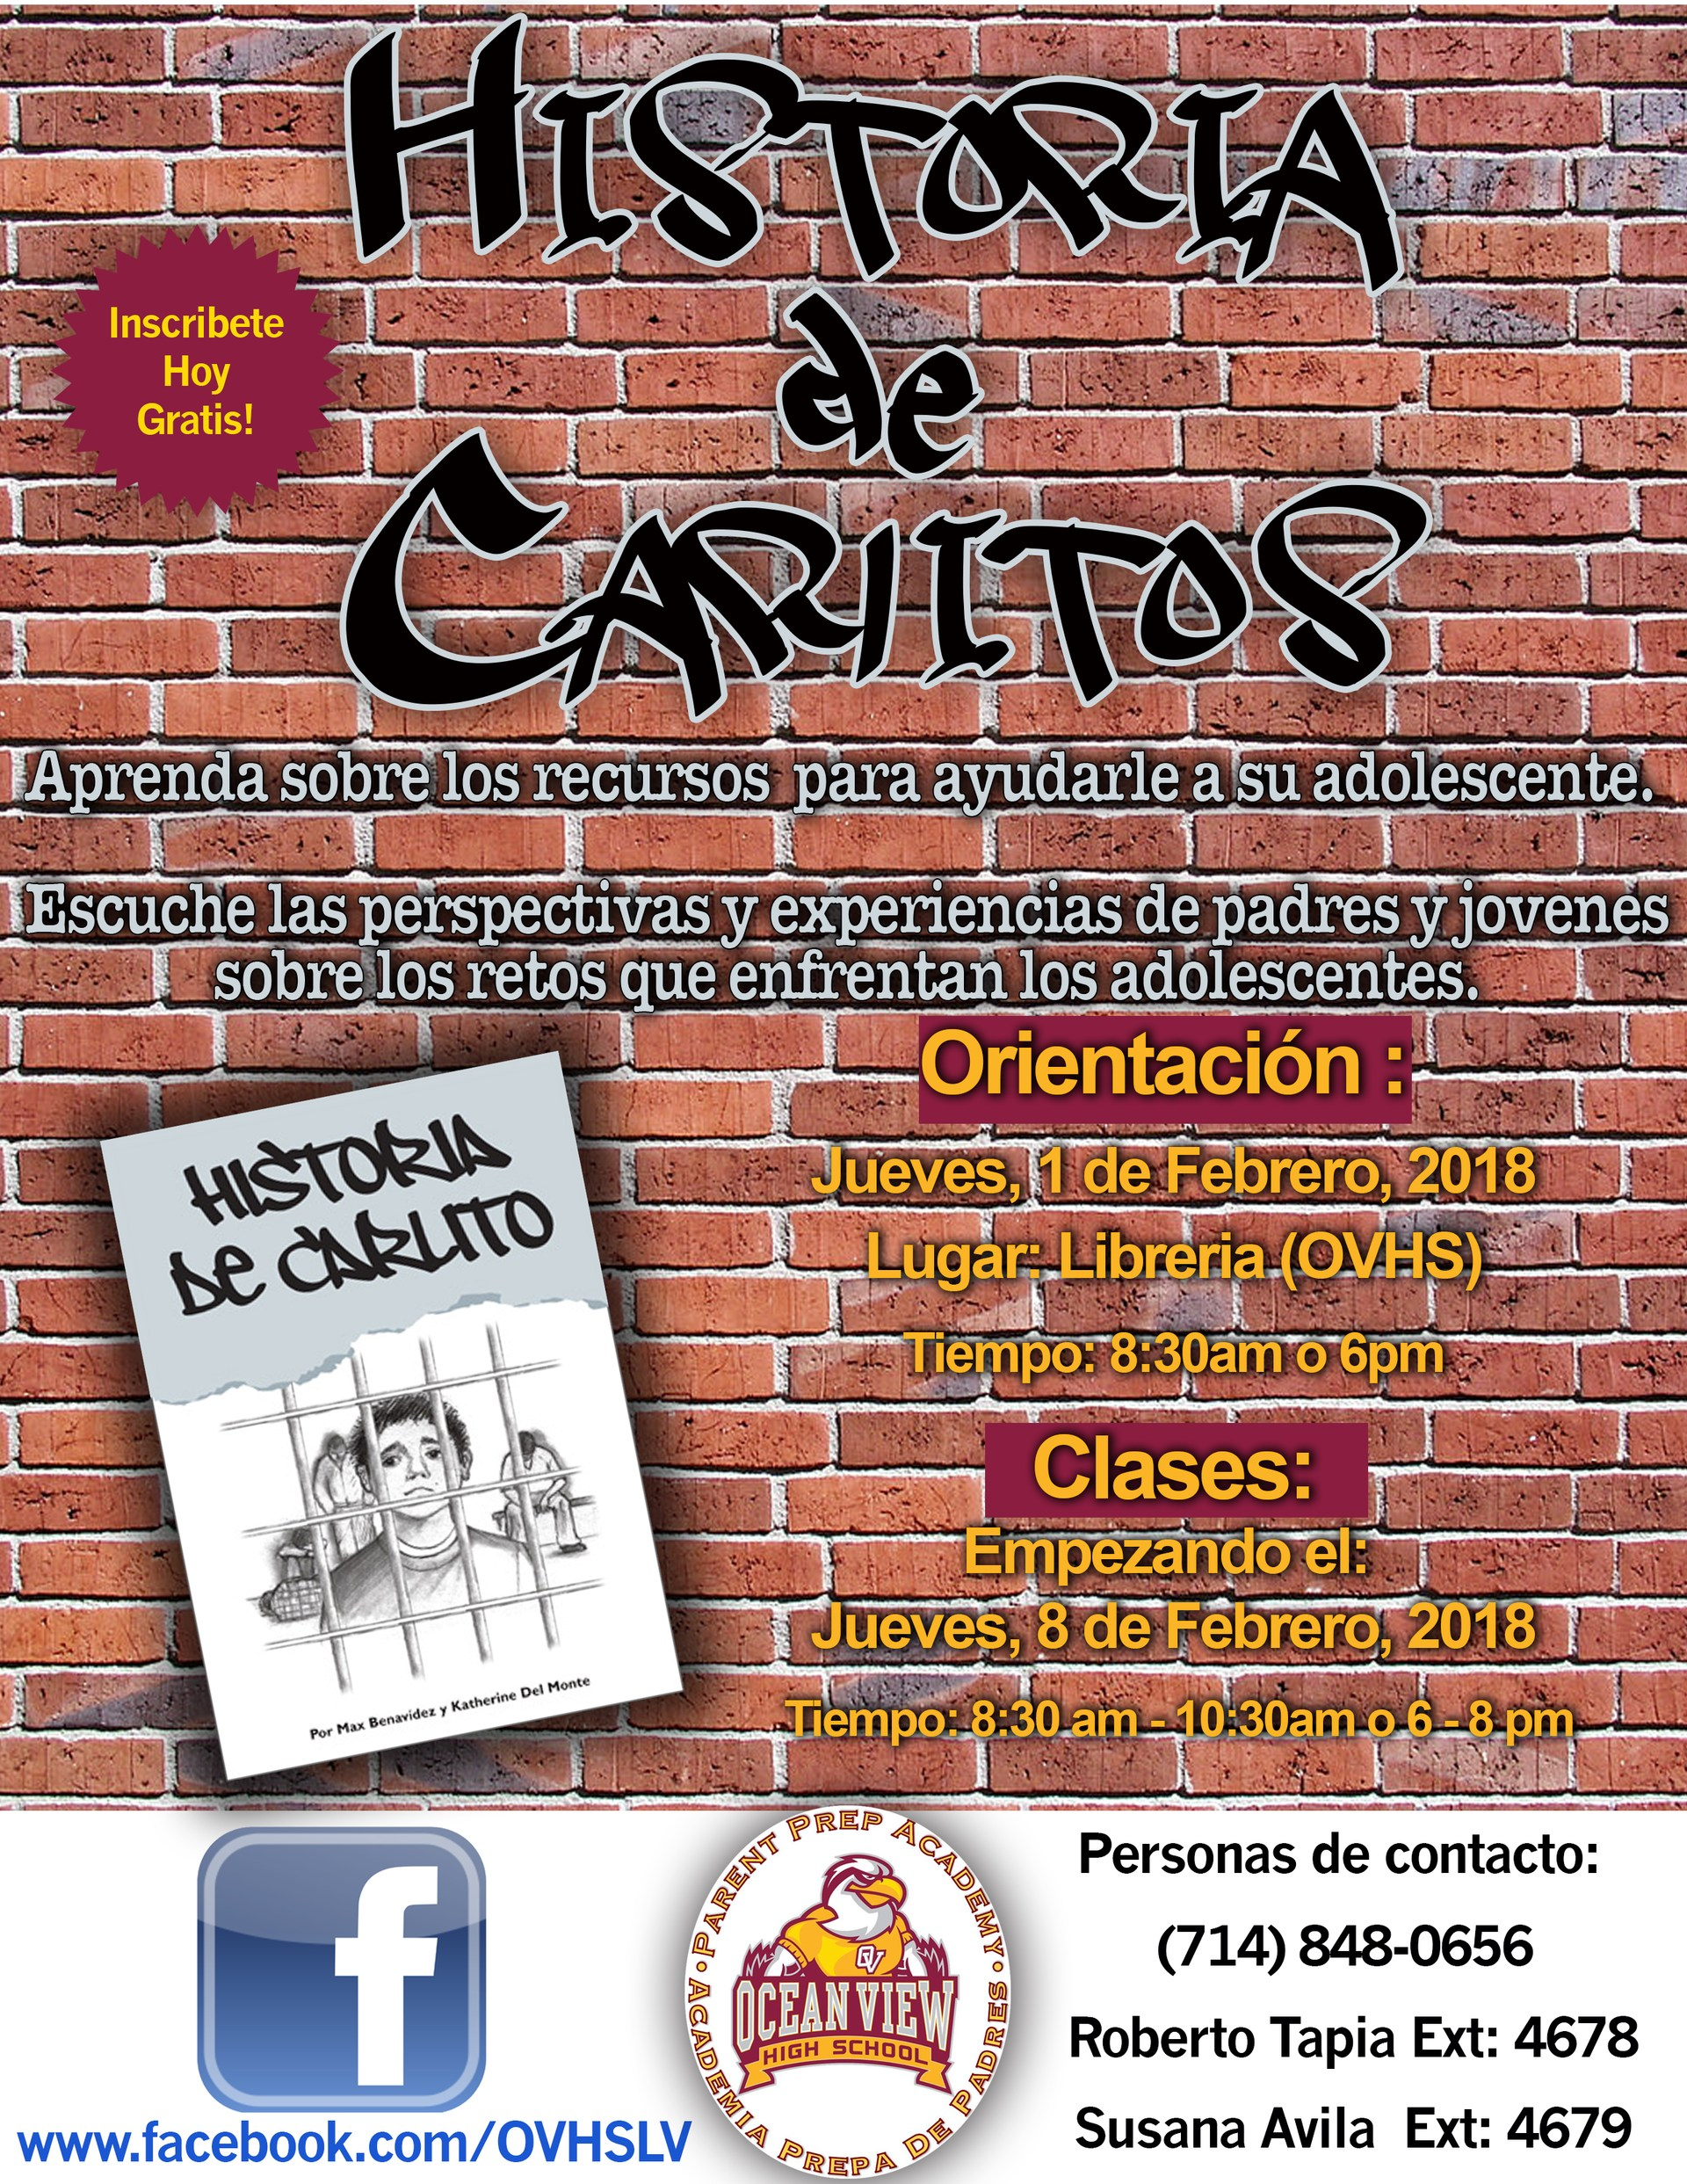 Historia de Carlitos